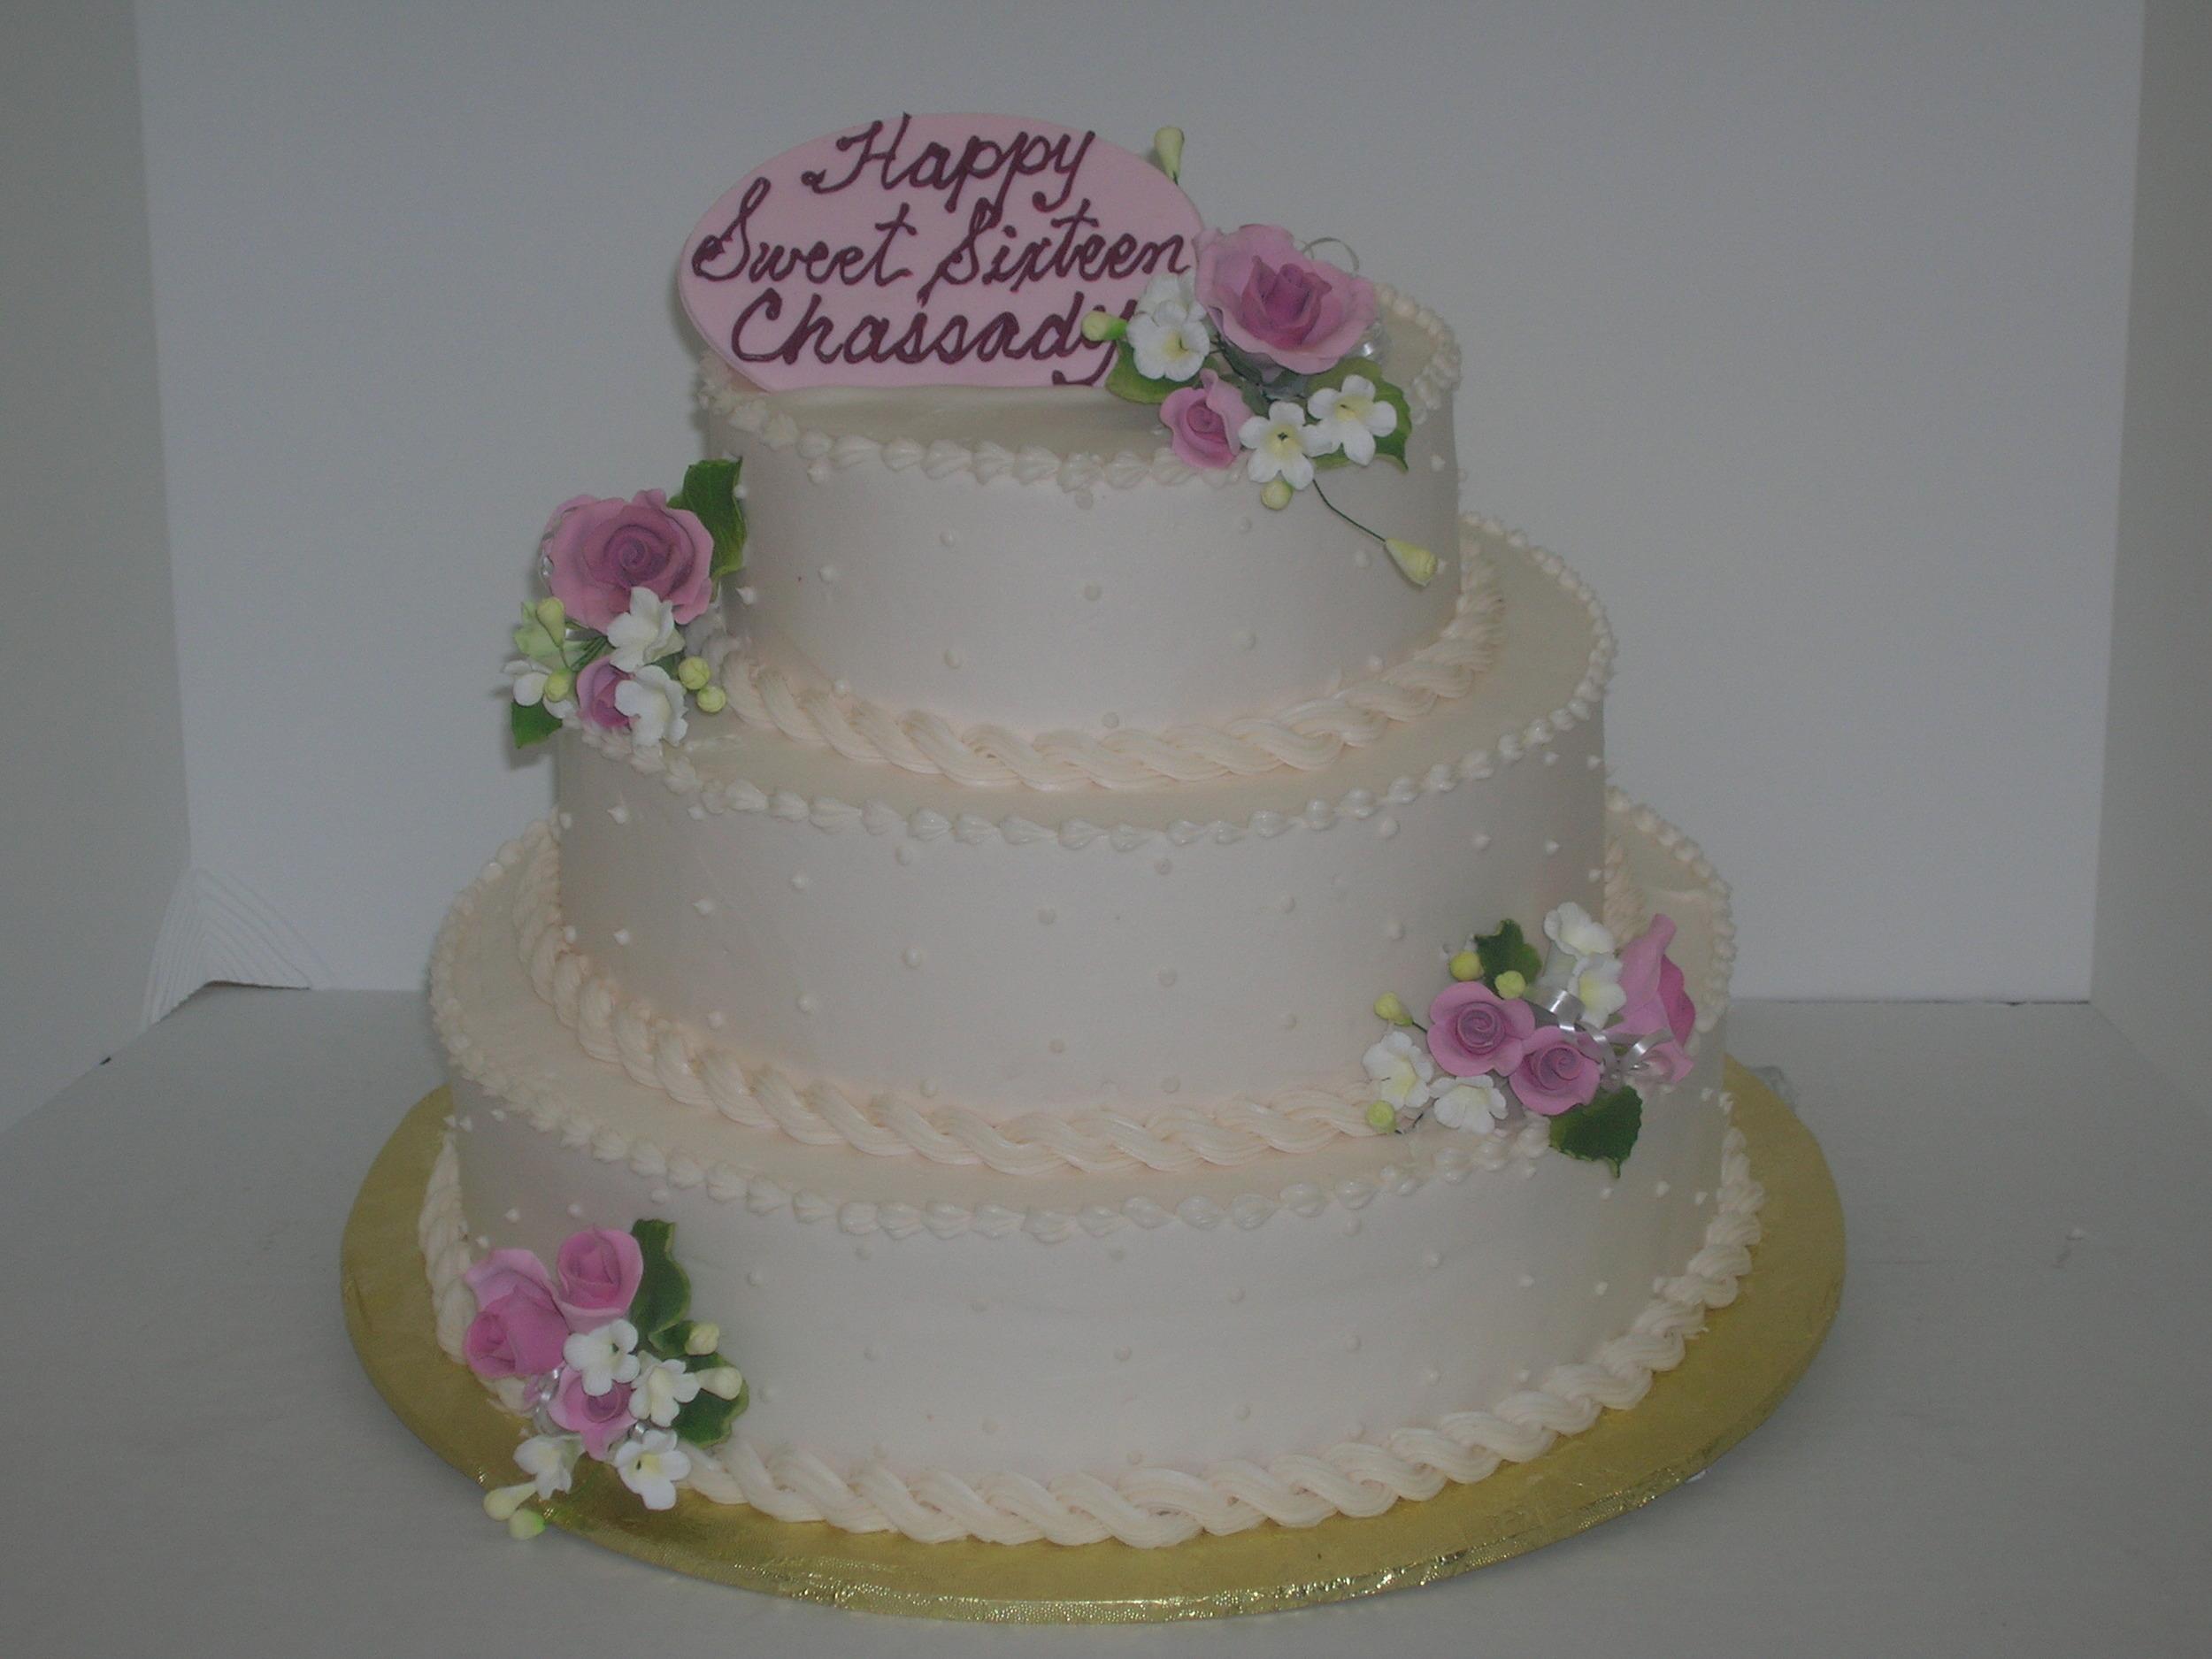 Style36wStraightedge.3tierIvoryBCropeborders.gumpasteflowers